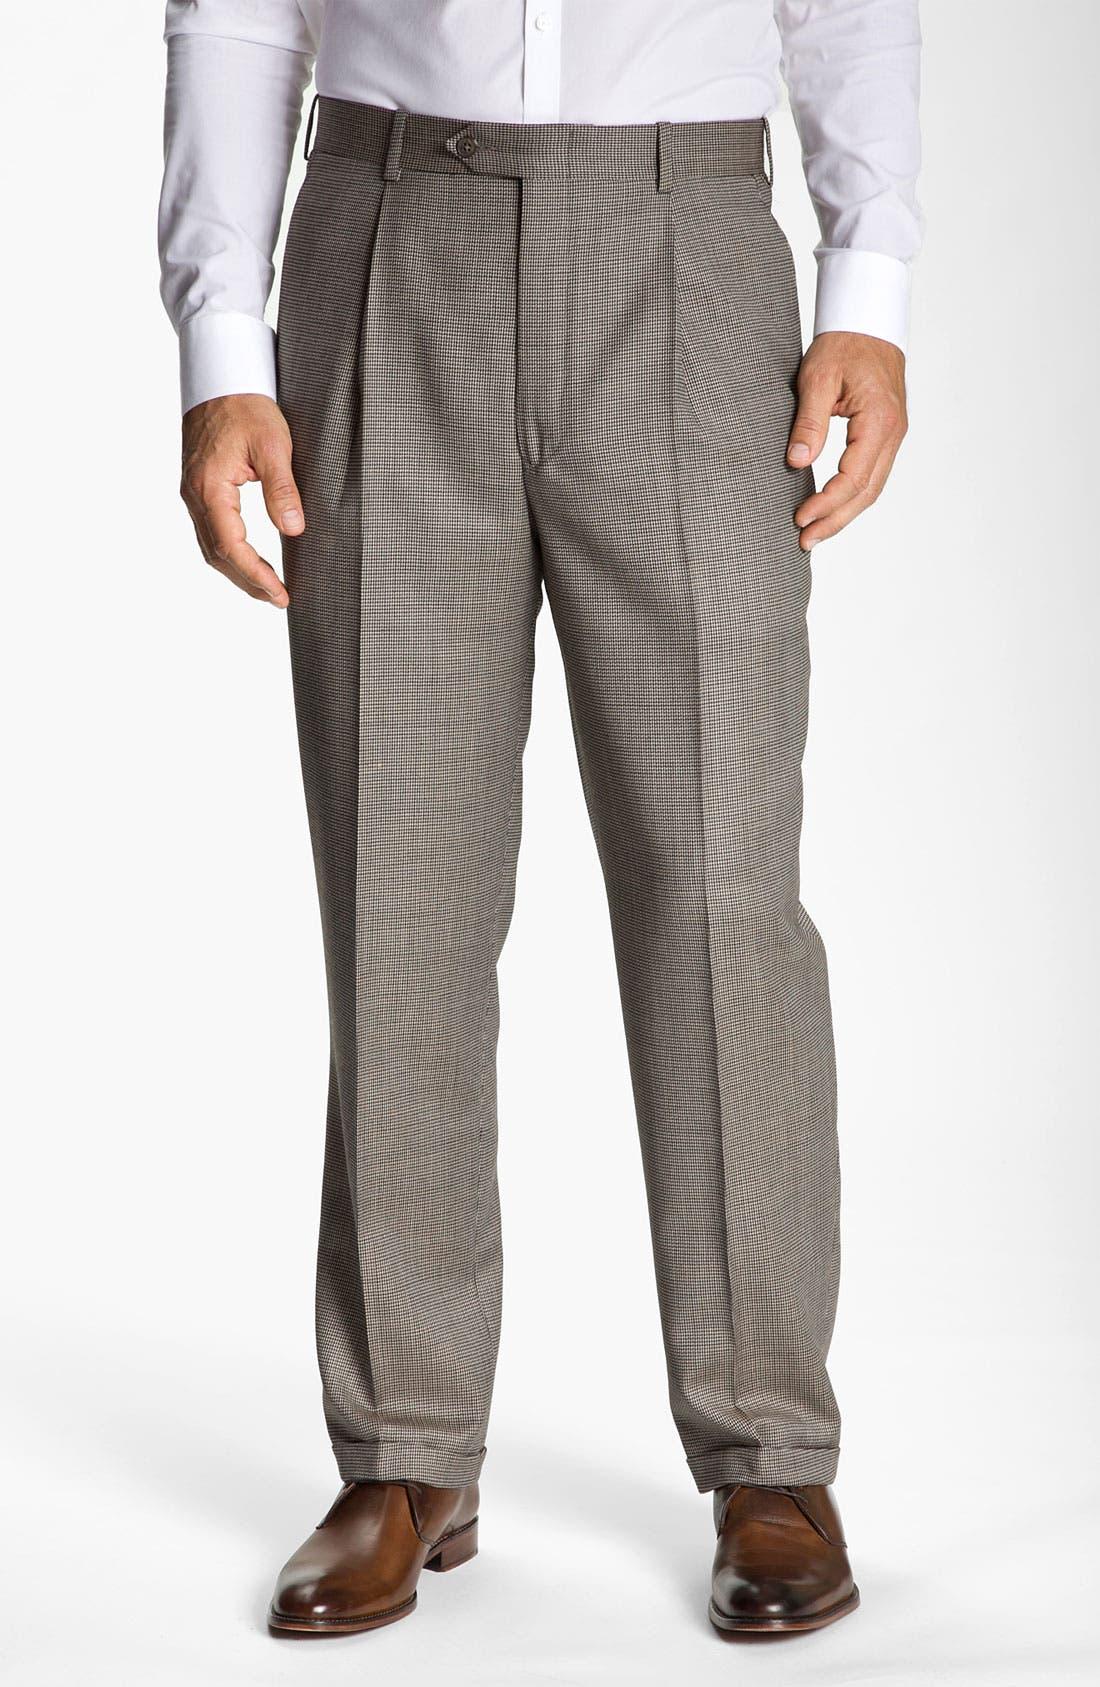 Main Image - Di Milano Uomo Single Pleat Trousers